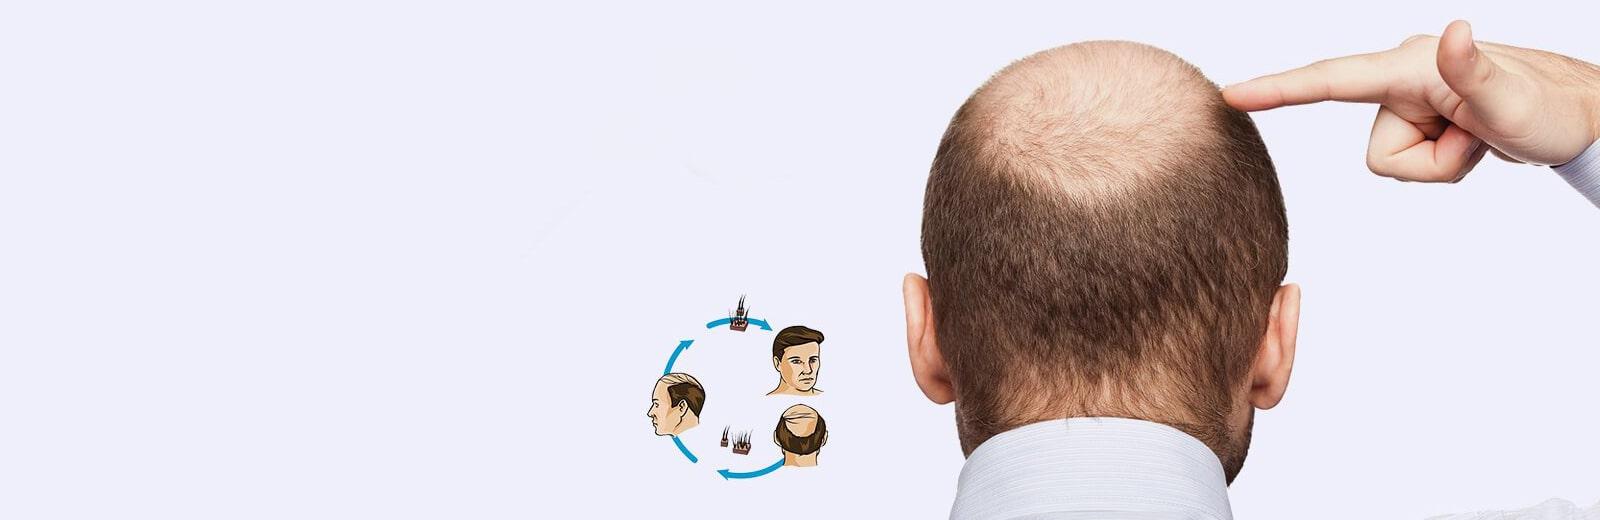 baldness solution hair transplant